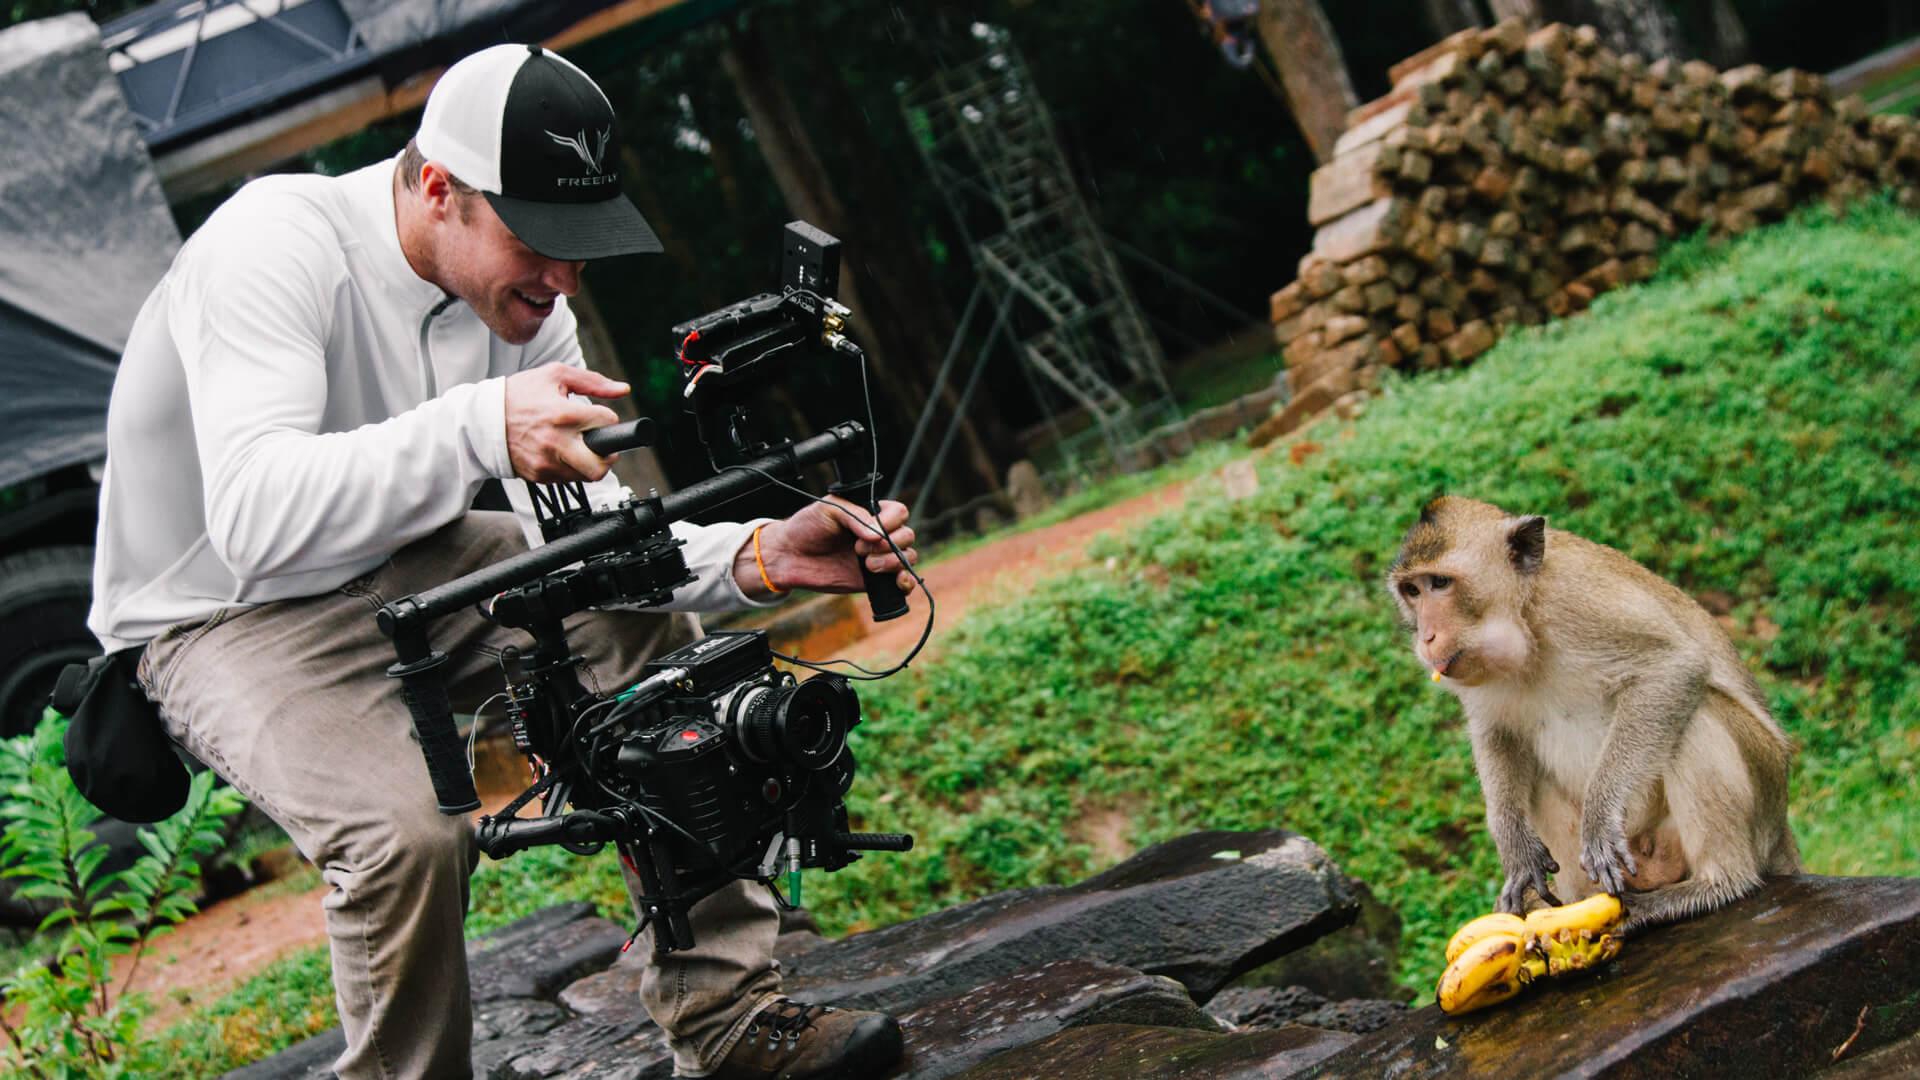 movi-operator-sam-nuttmann-cambodia-bbc-monsoon-monkeys